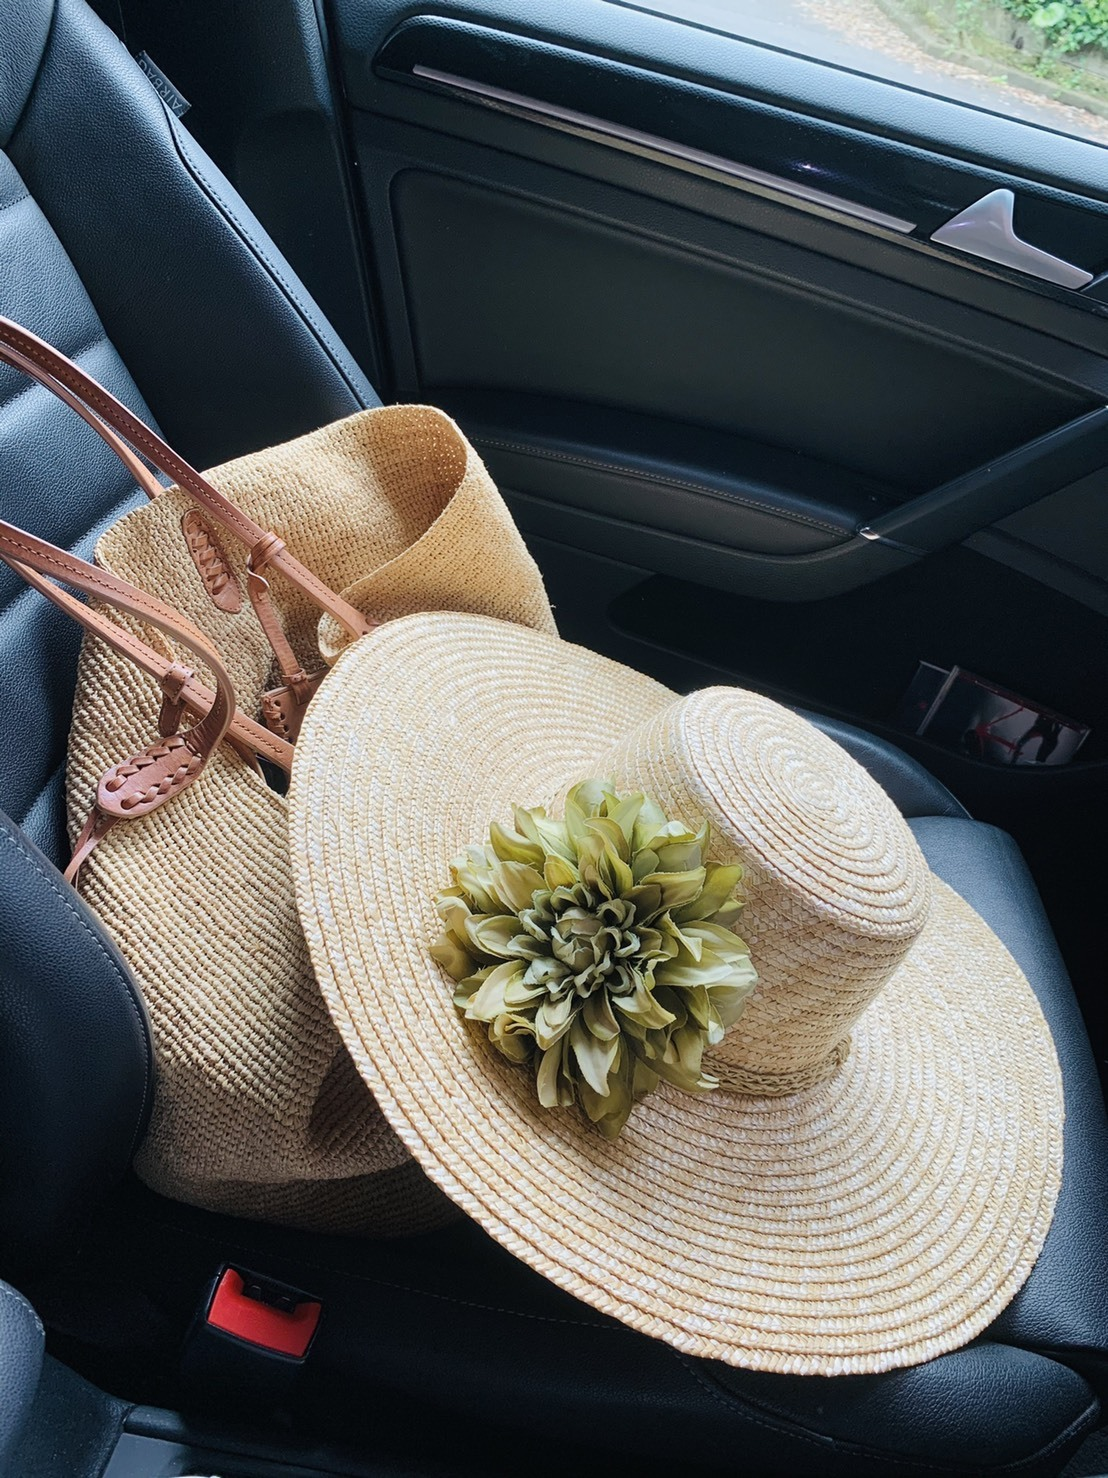 jマダムのお帽子Style♪_1_4-1